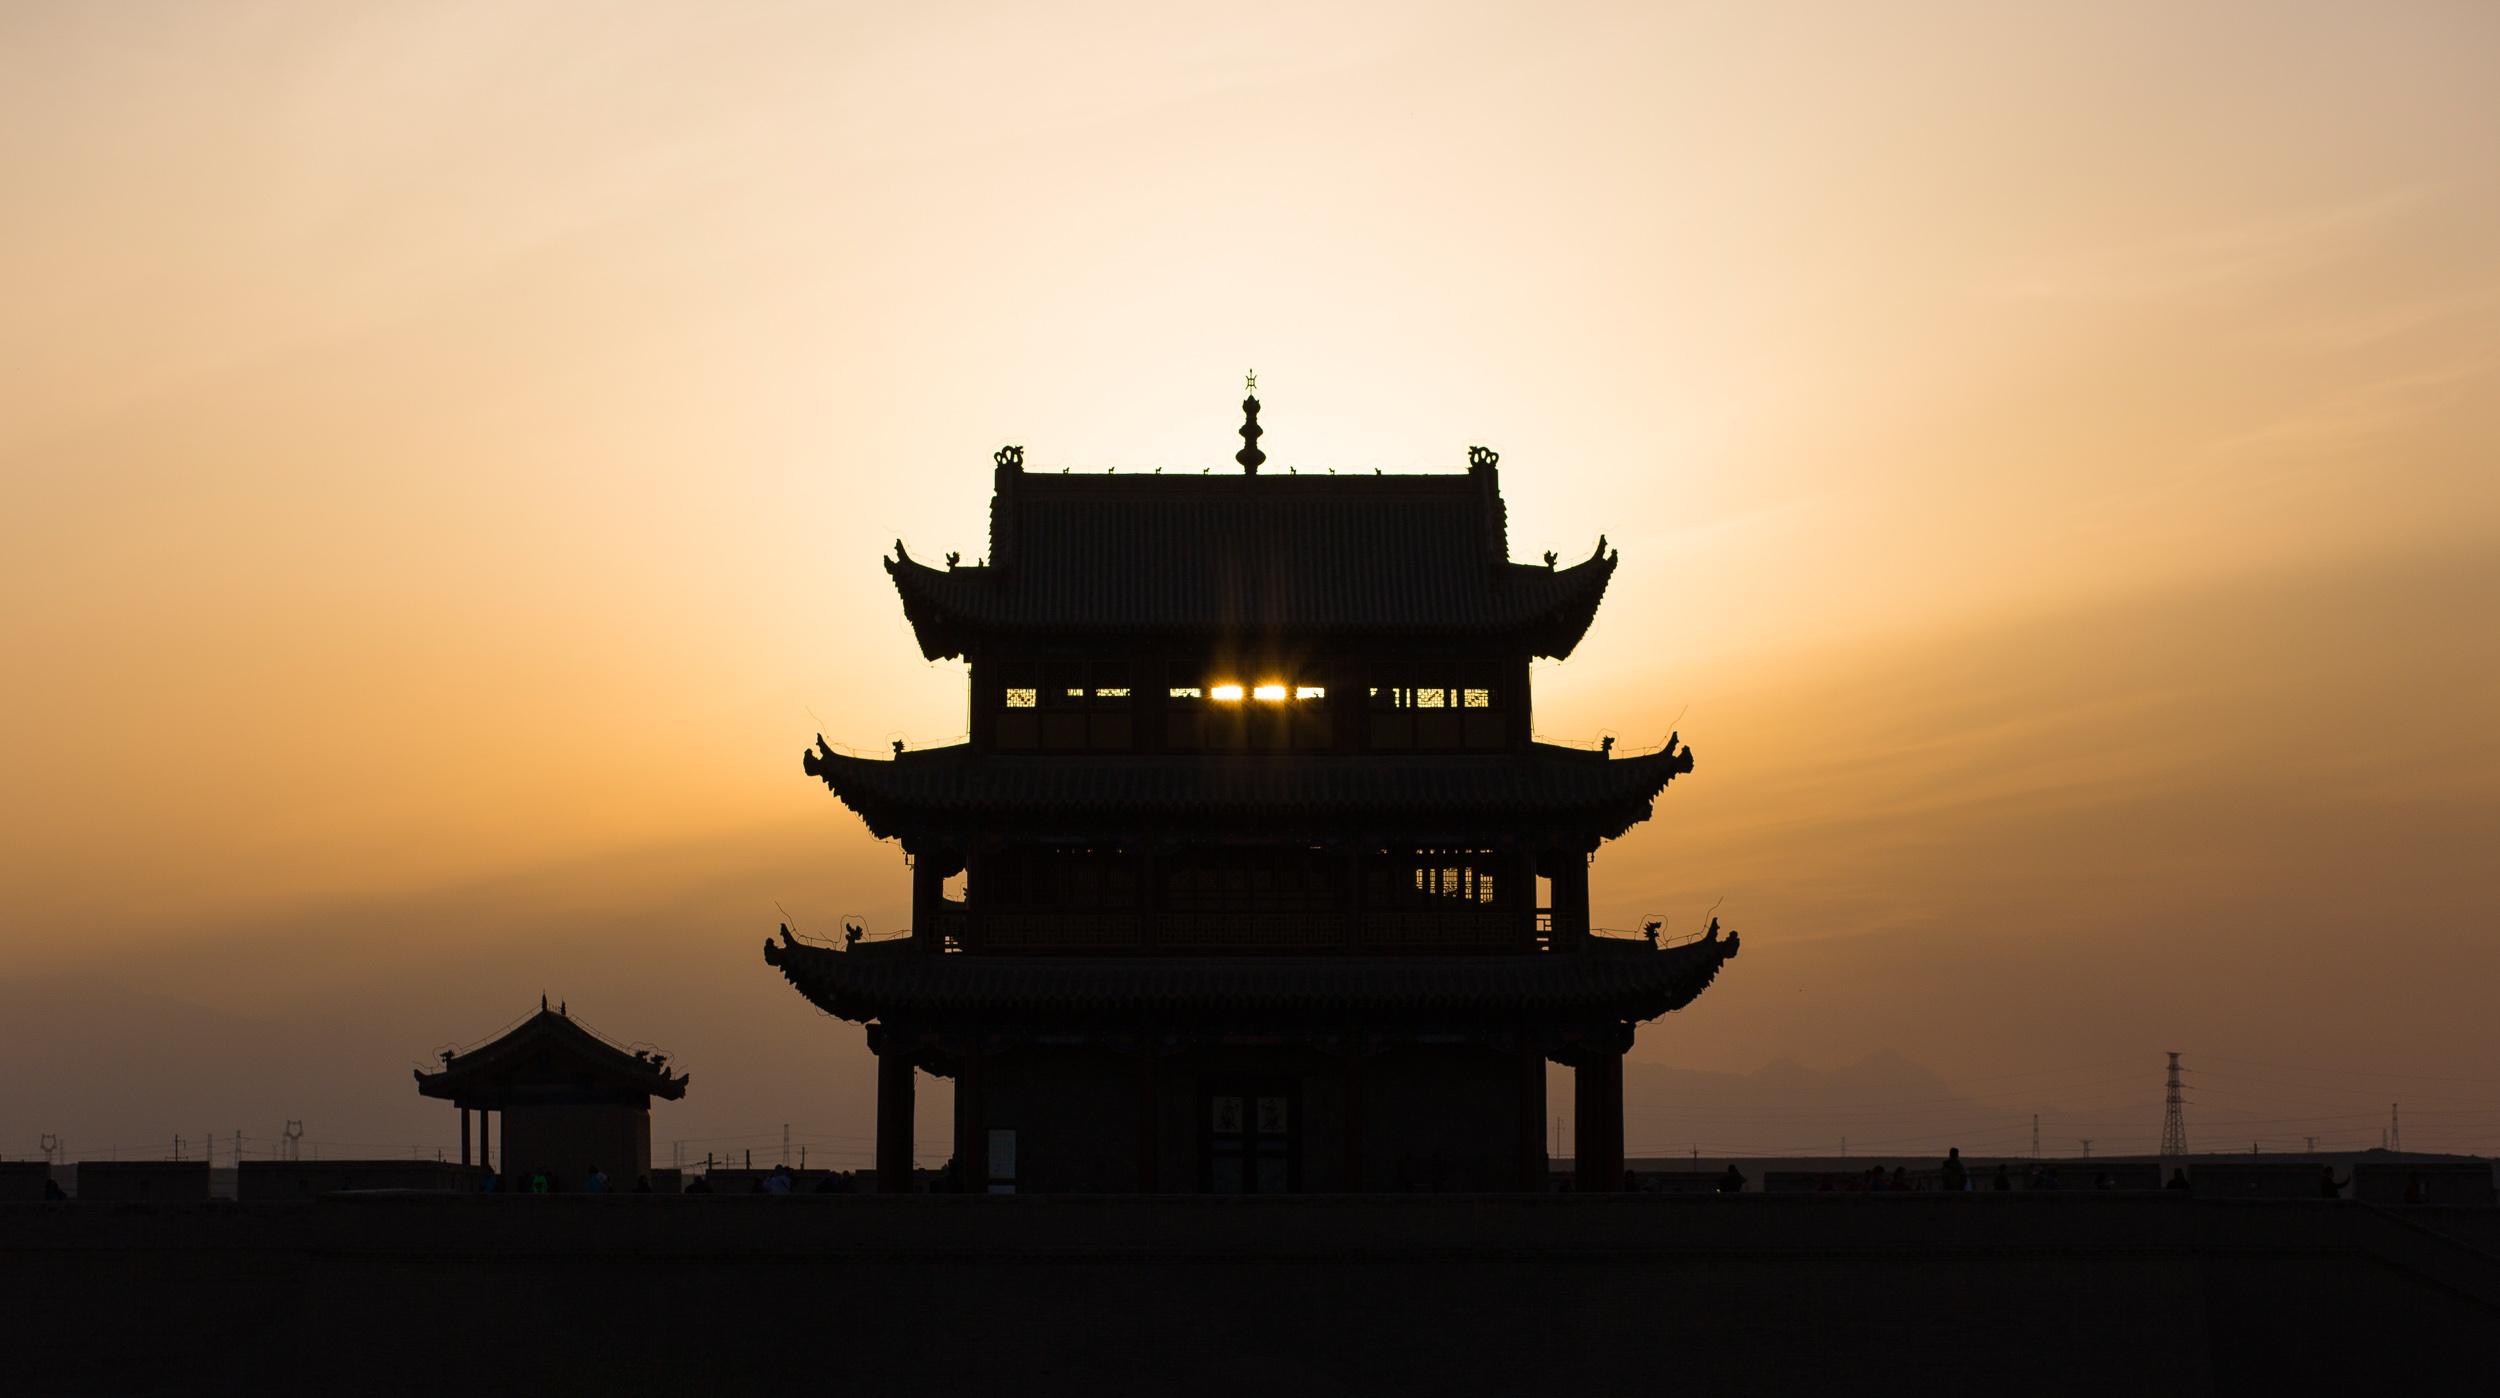 Architecture traditionnelle à Jiayuguan - Muraille de Chine